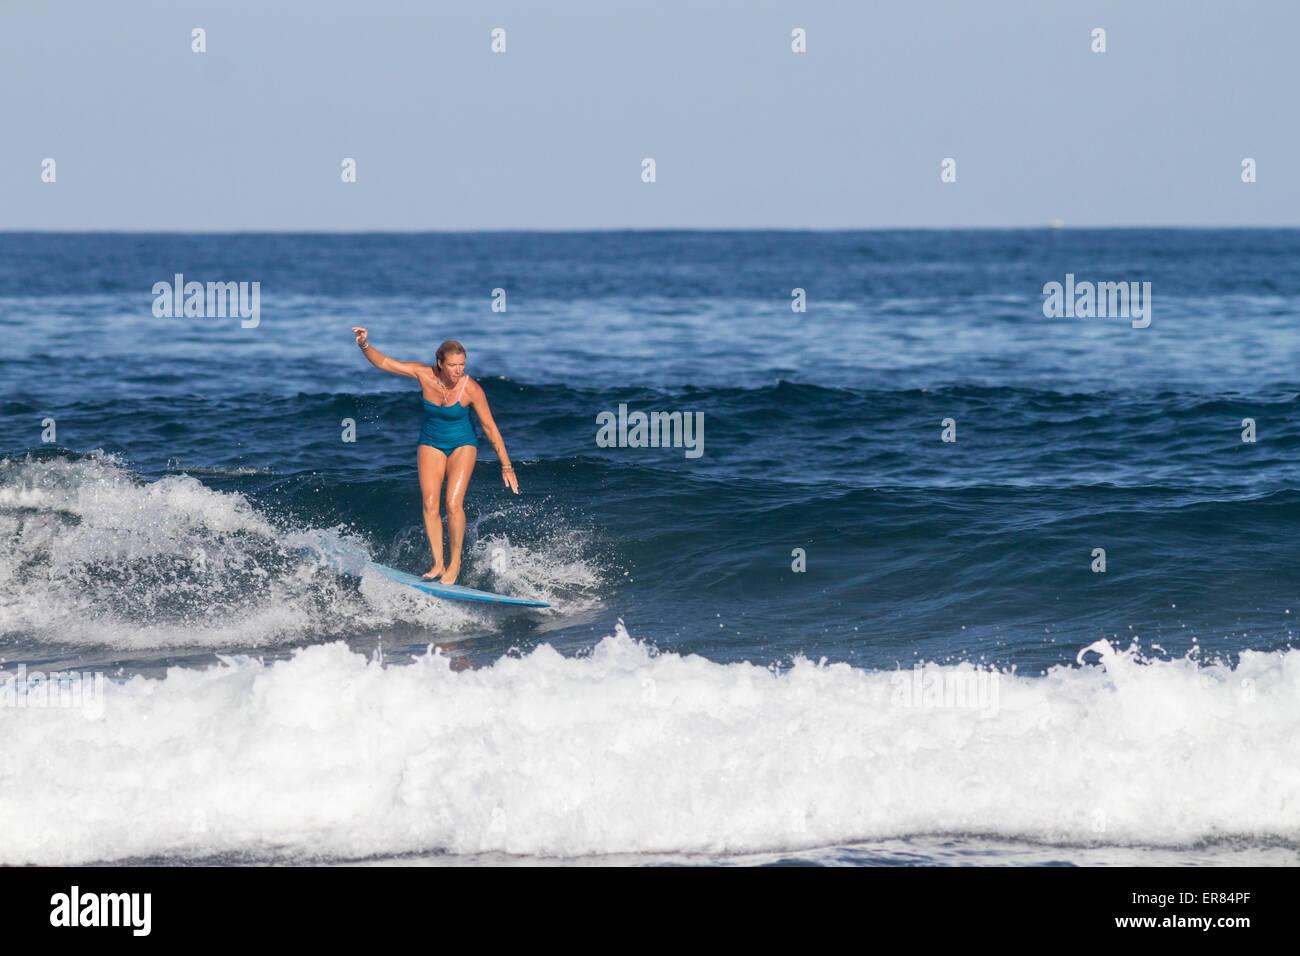 Blonde surfer girl surfing in bikini with a longboard - Stock Image